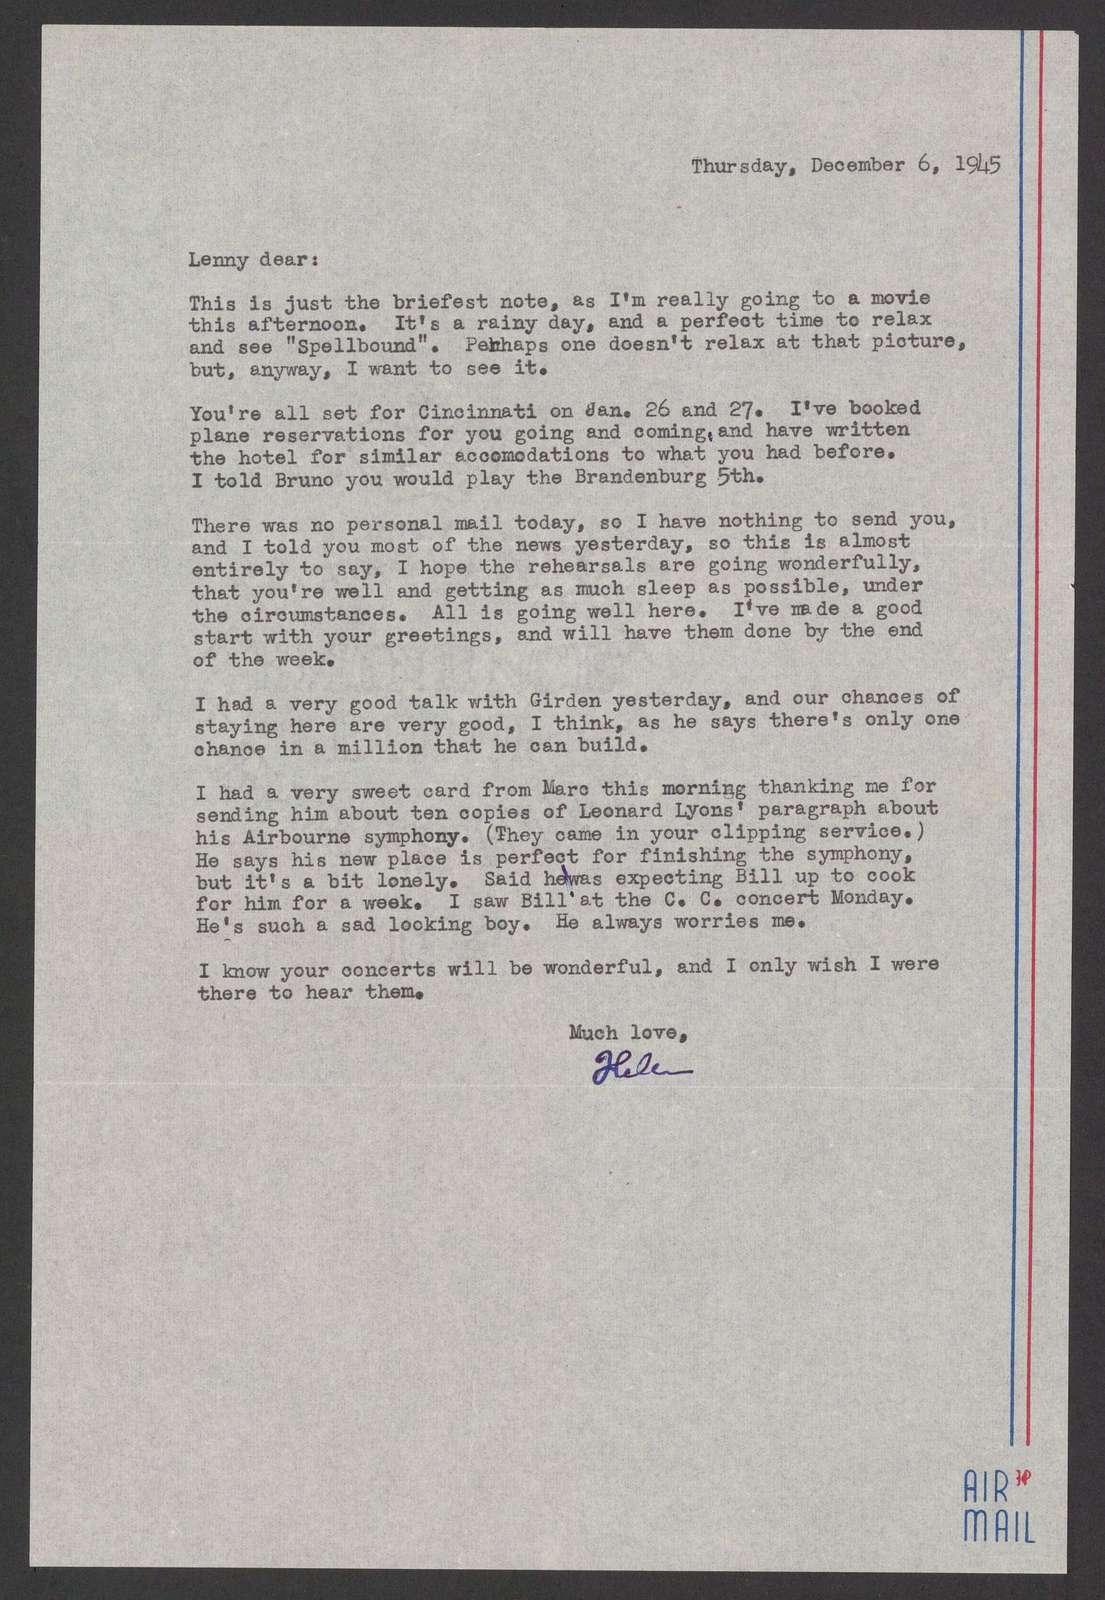 Helen Coates to Leonard Bernstein, December 6, 1945